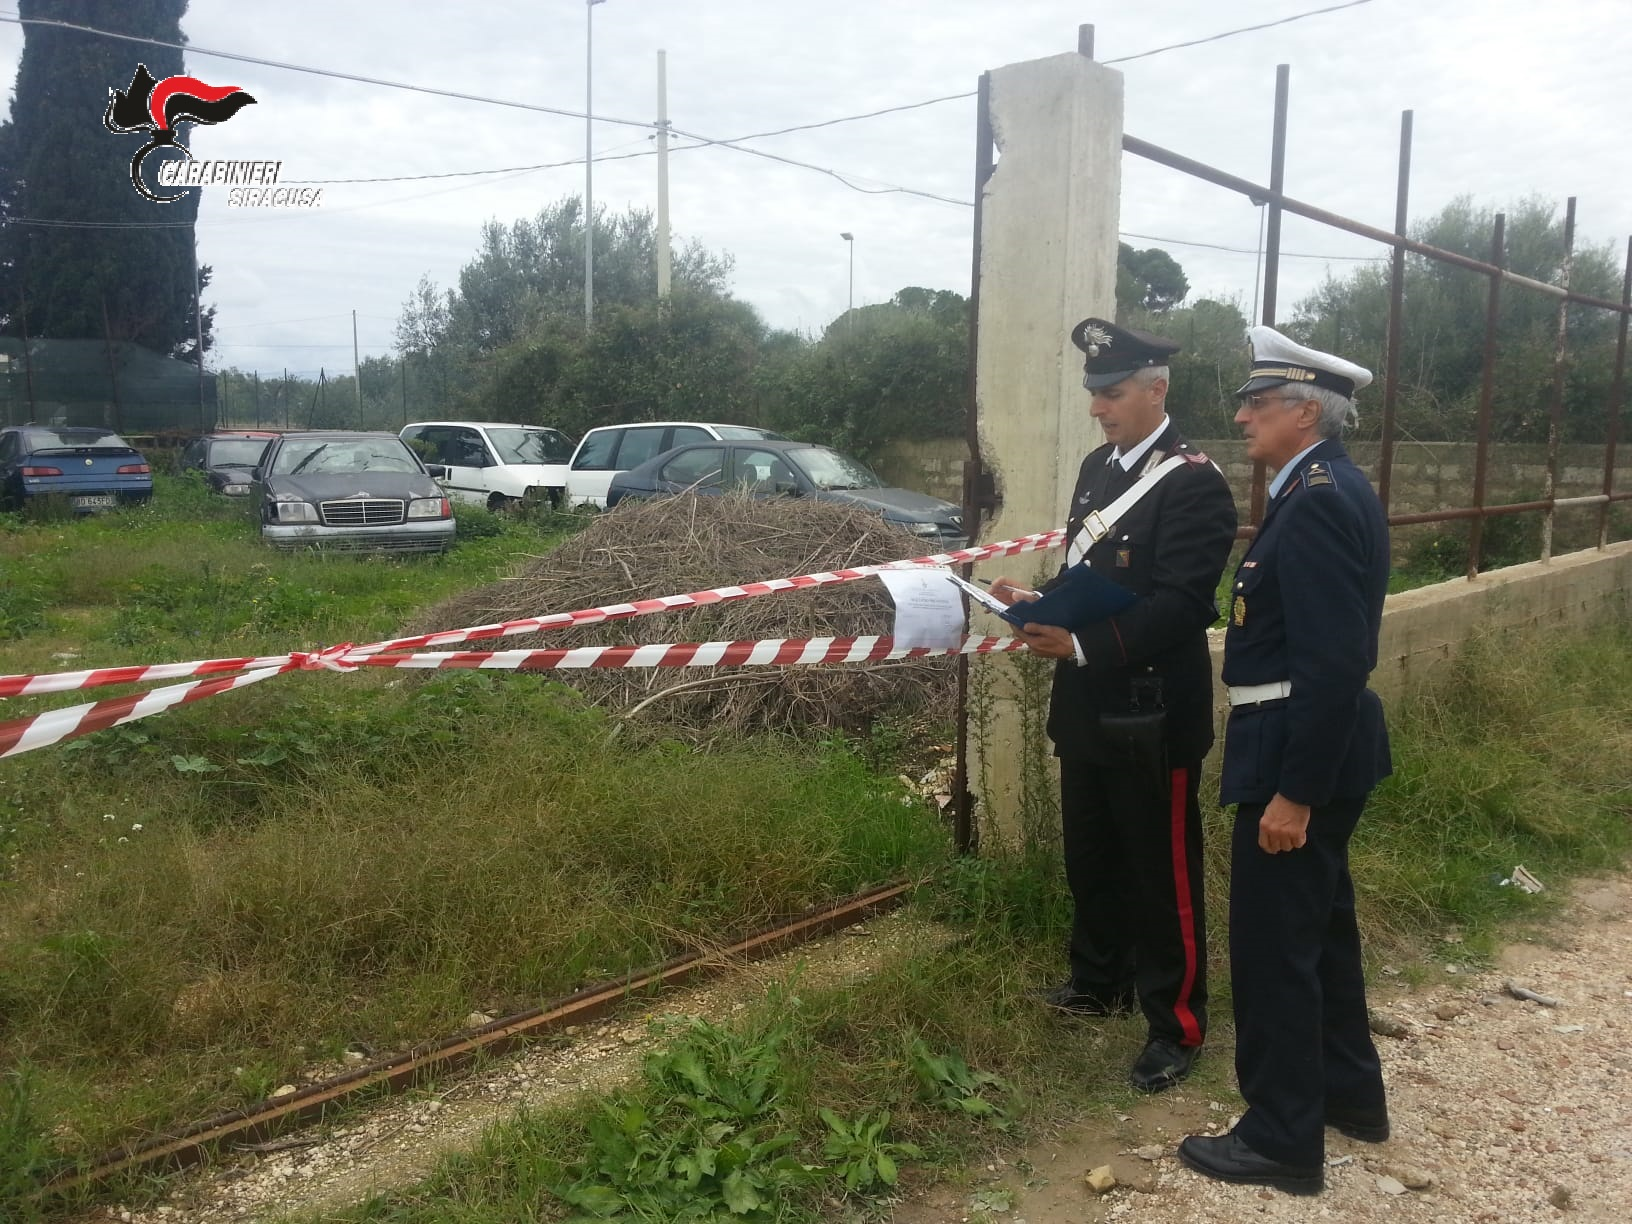 Siracusa, carcasse di auto e materiali ferrosi sequestrati a Cassibile